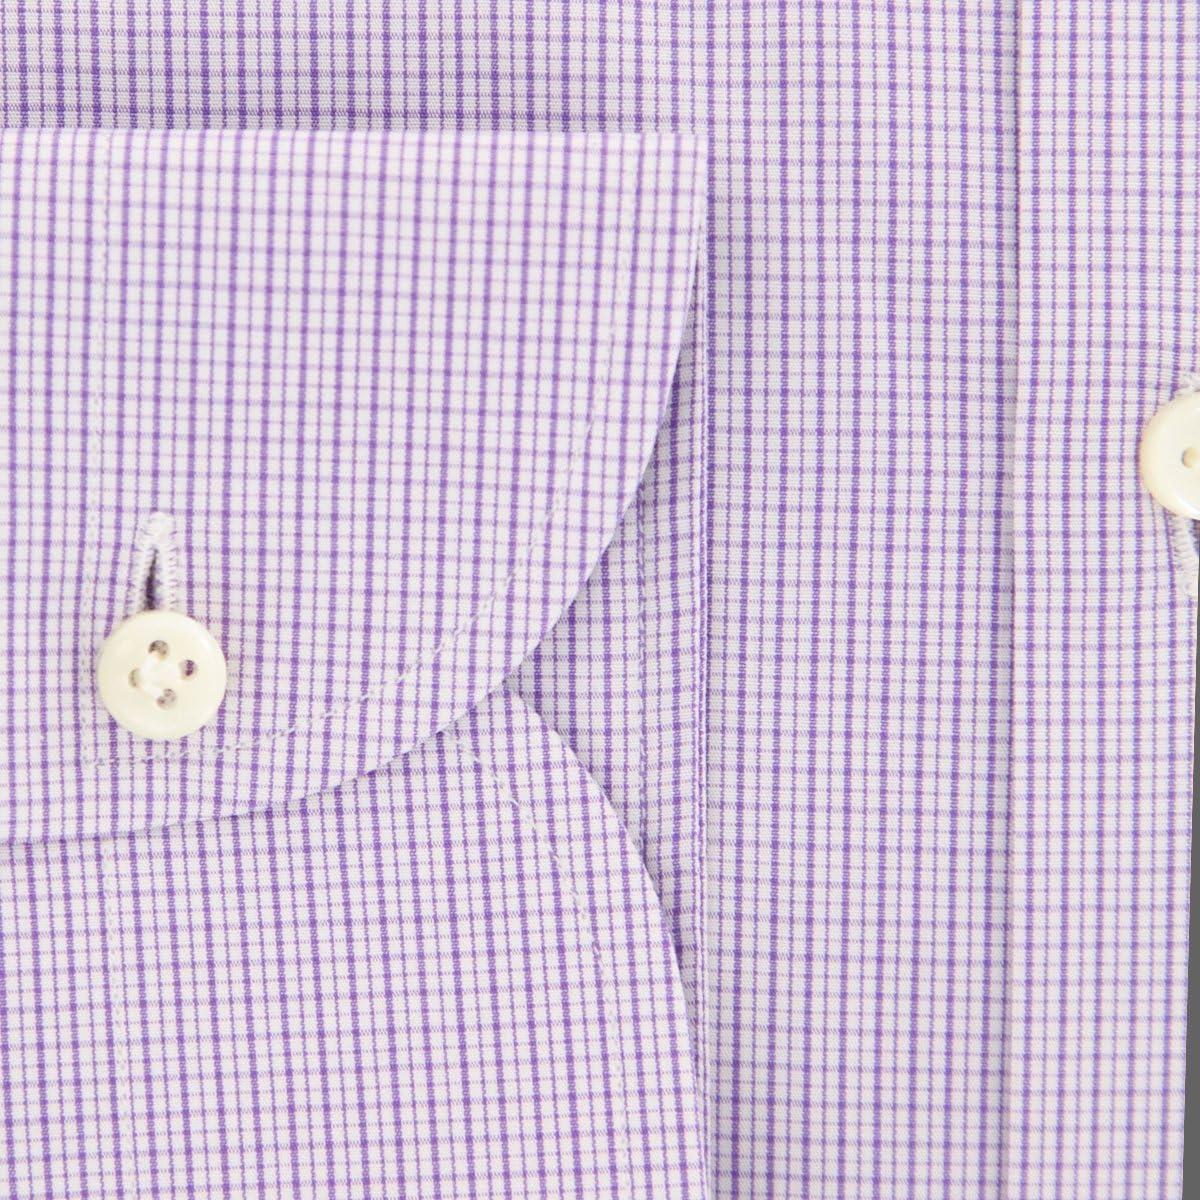 Luigi Borrelli Stripes Button Down Cutaway Collar Cotton Slim Fit Dress Shirt